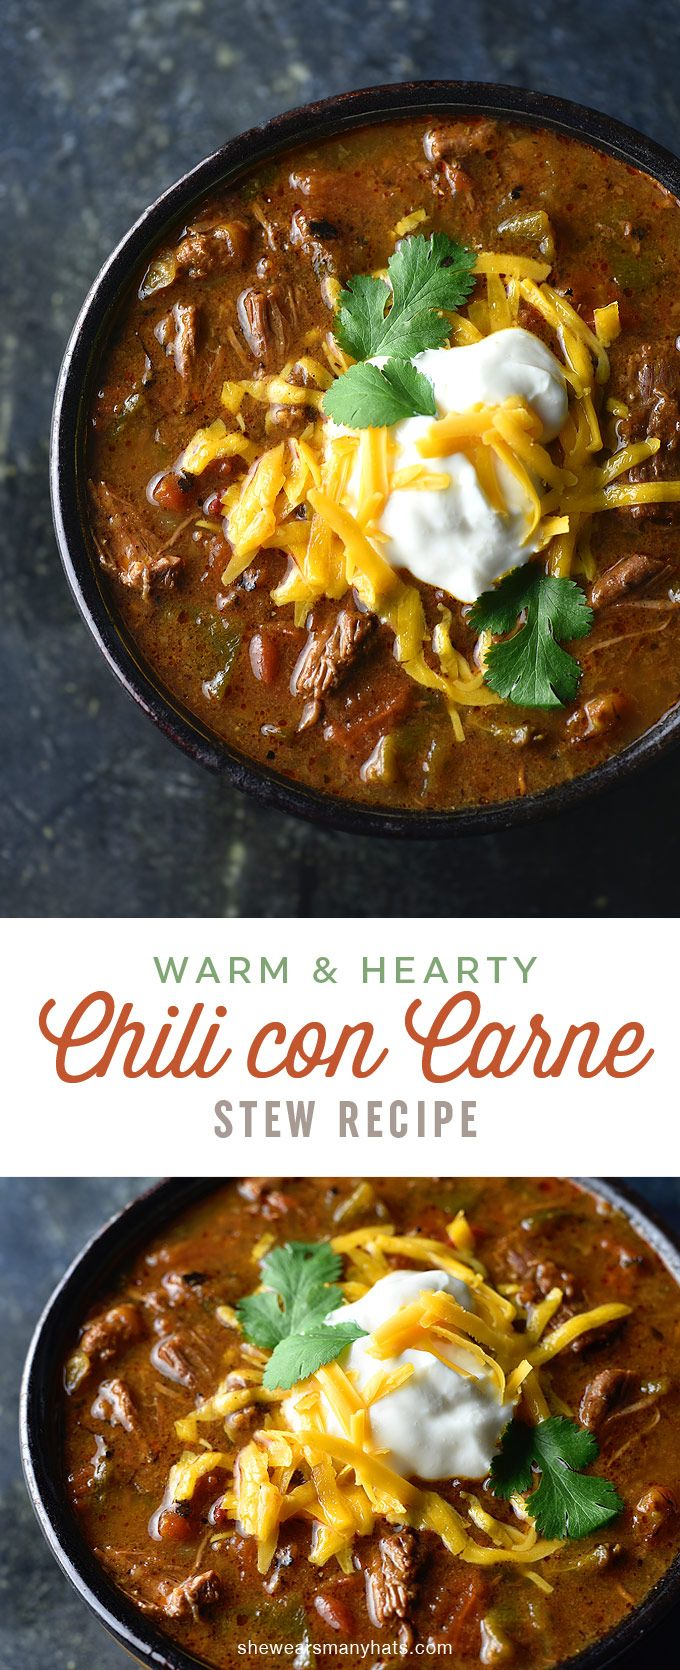 Chili Con Carne Recipe | shewearsmanyhats.com http://shewearsmanyhats.com/chili-con-carne-recipe/